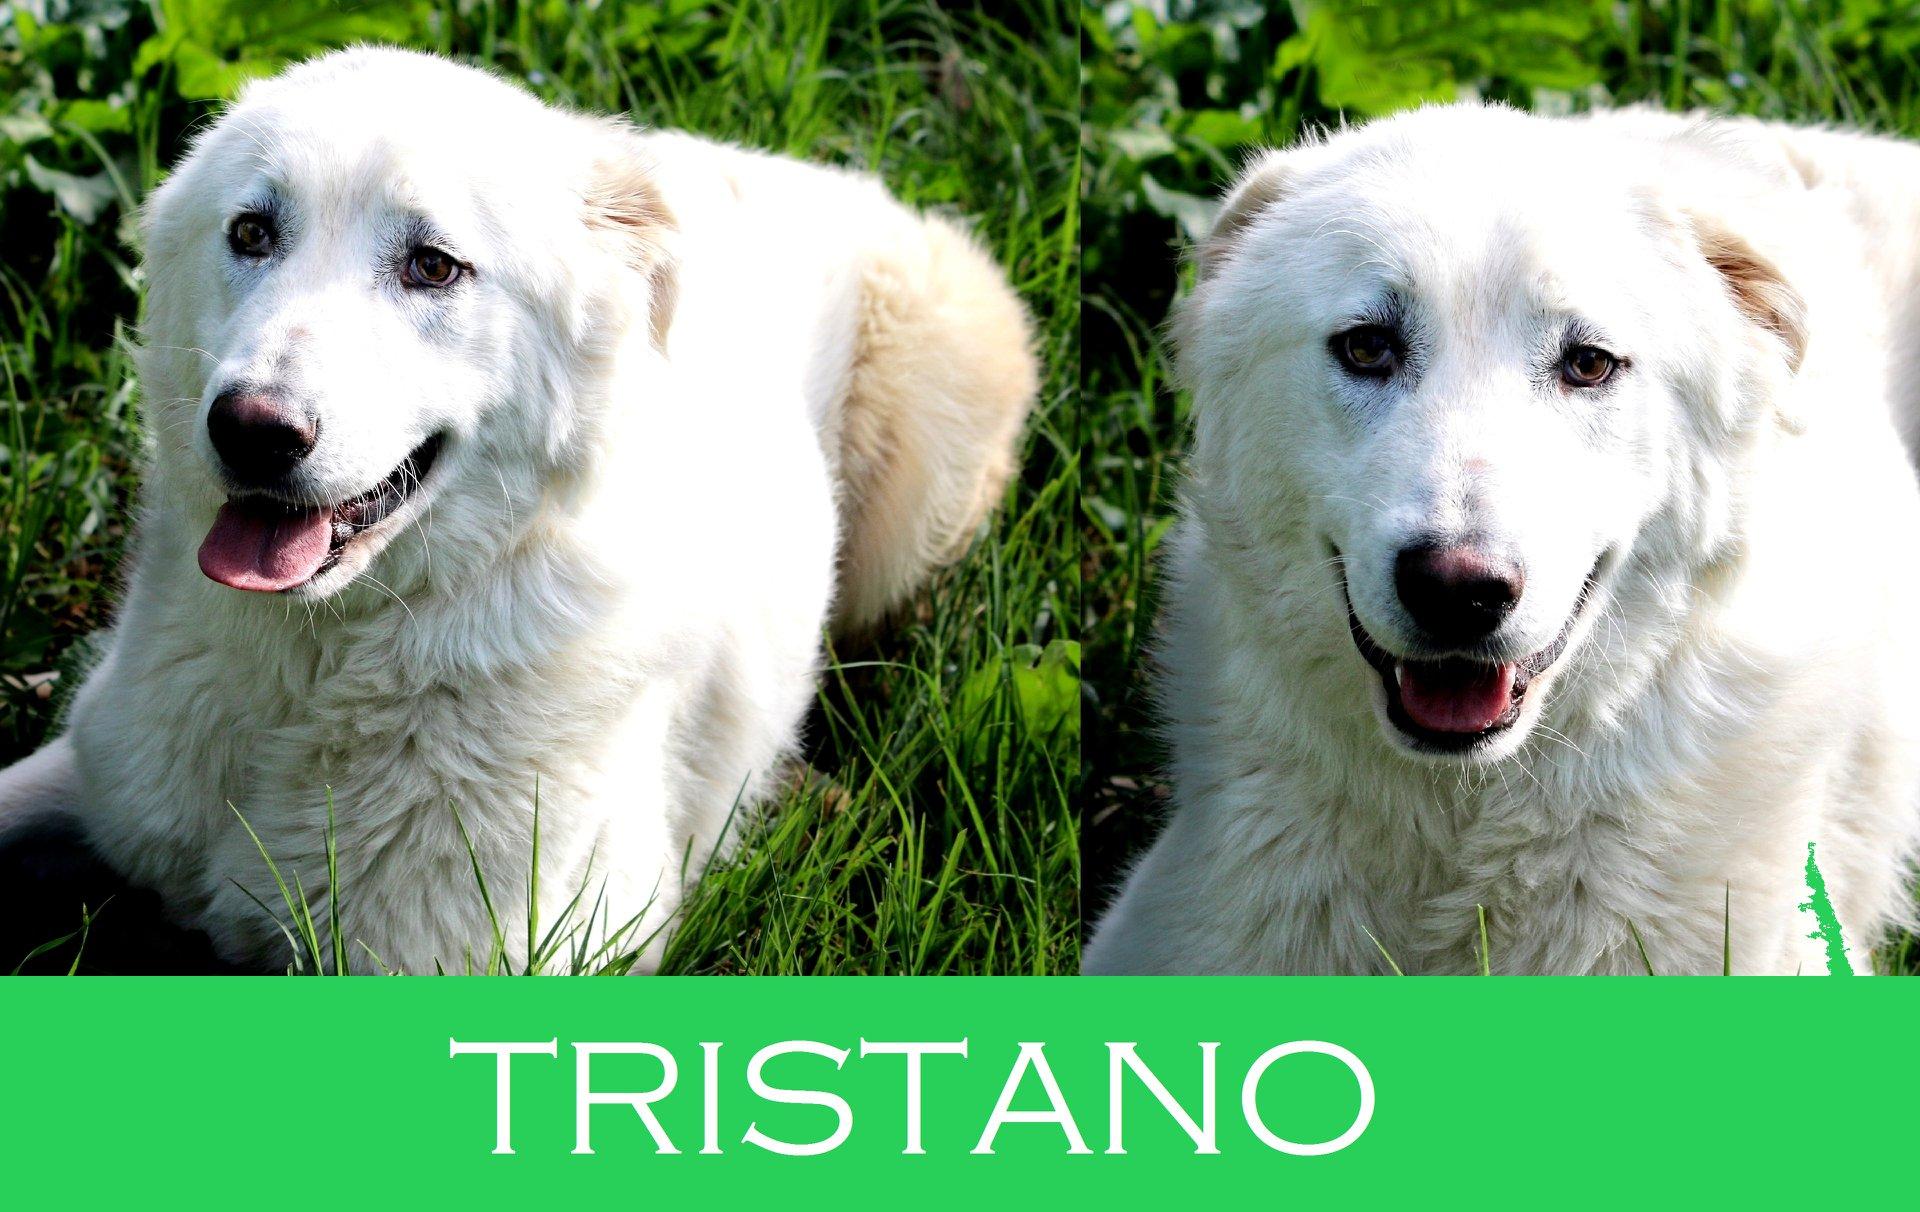 Tristano